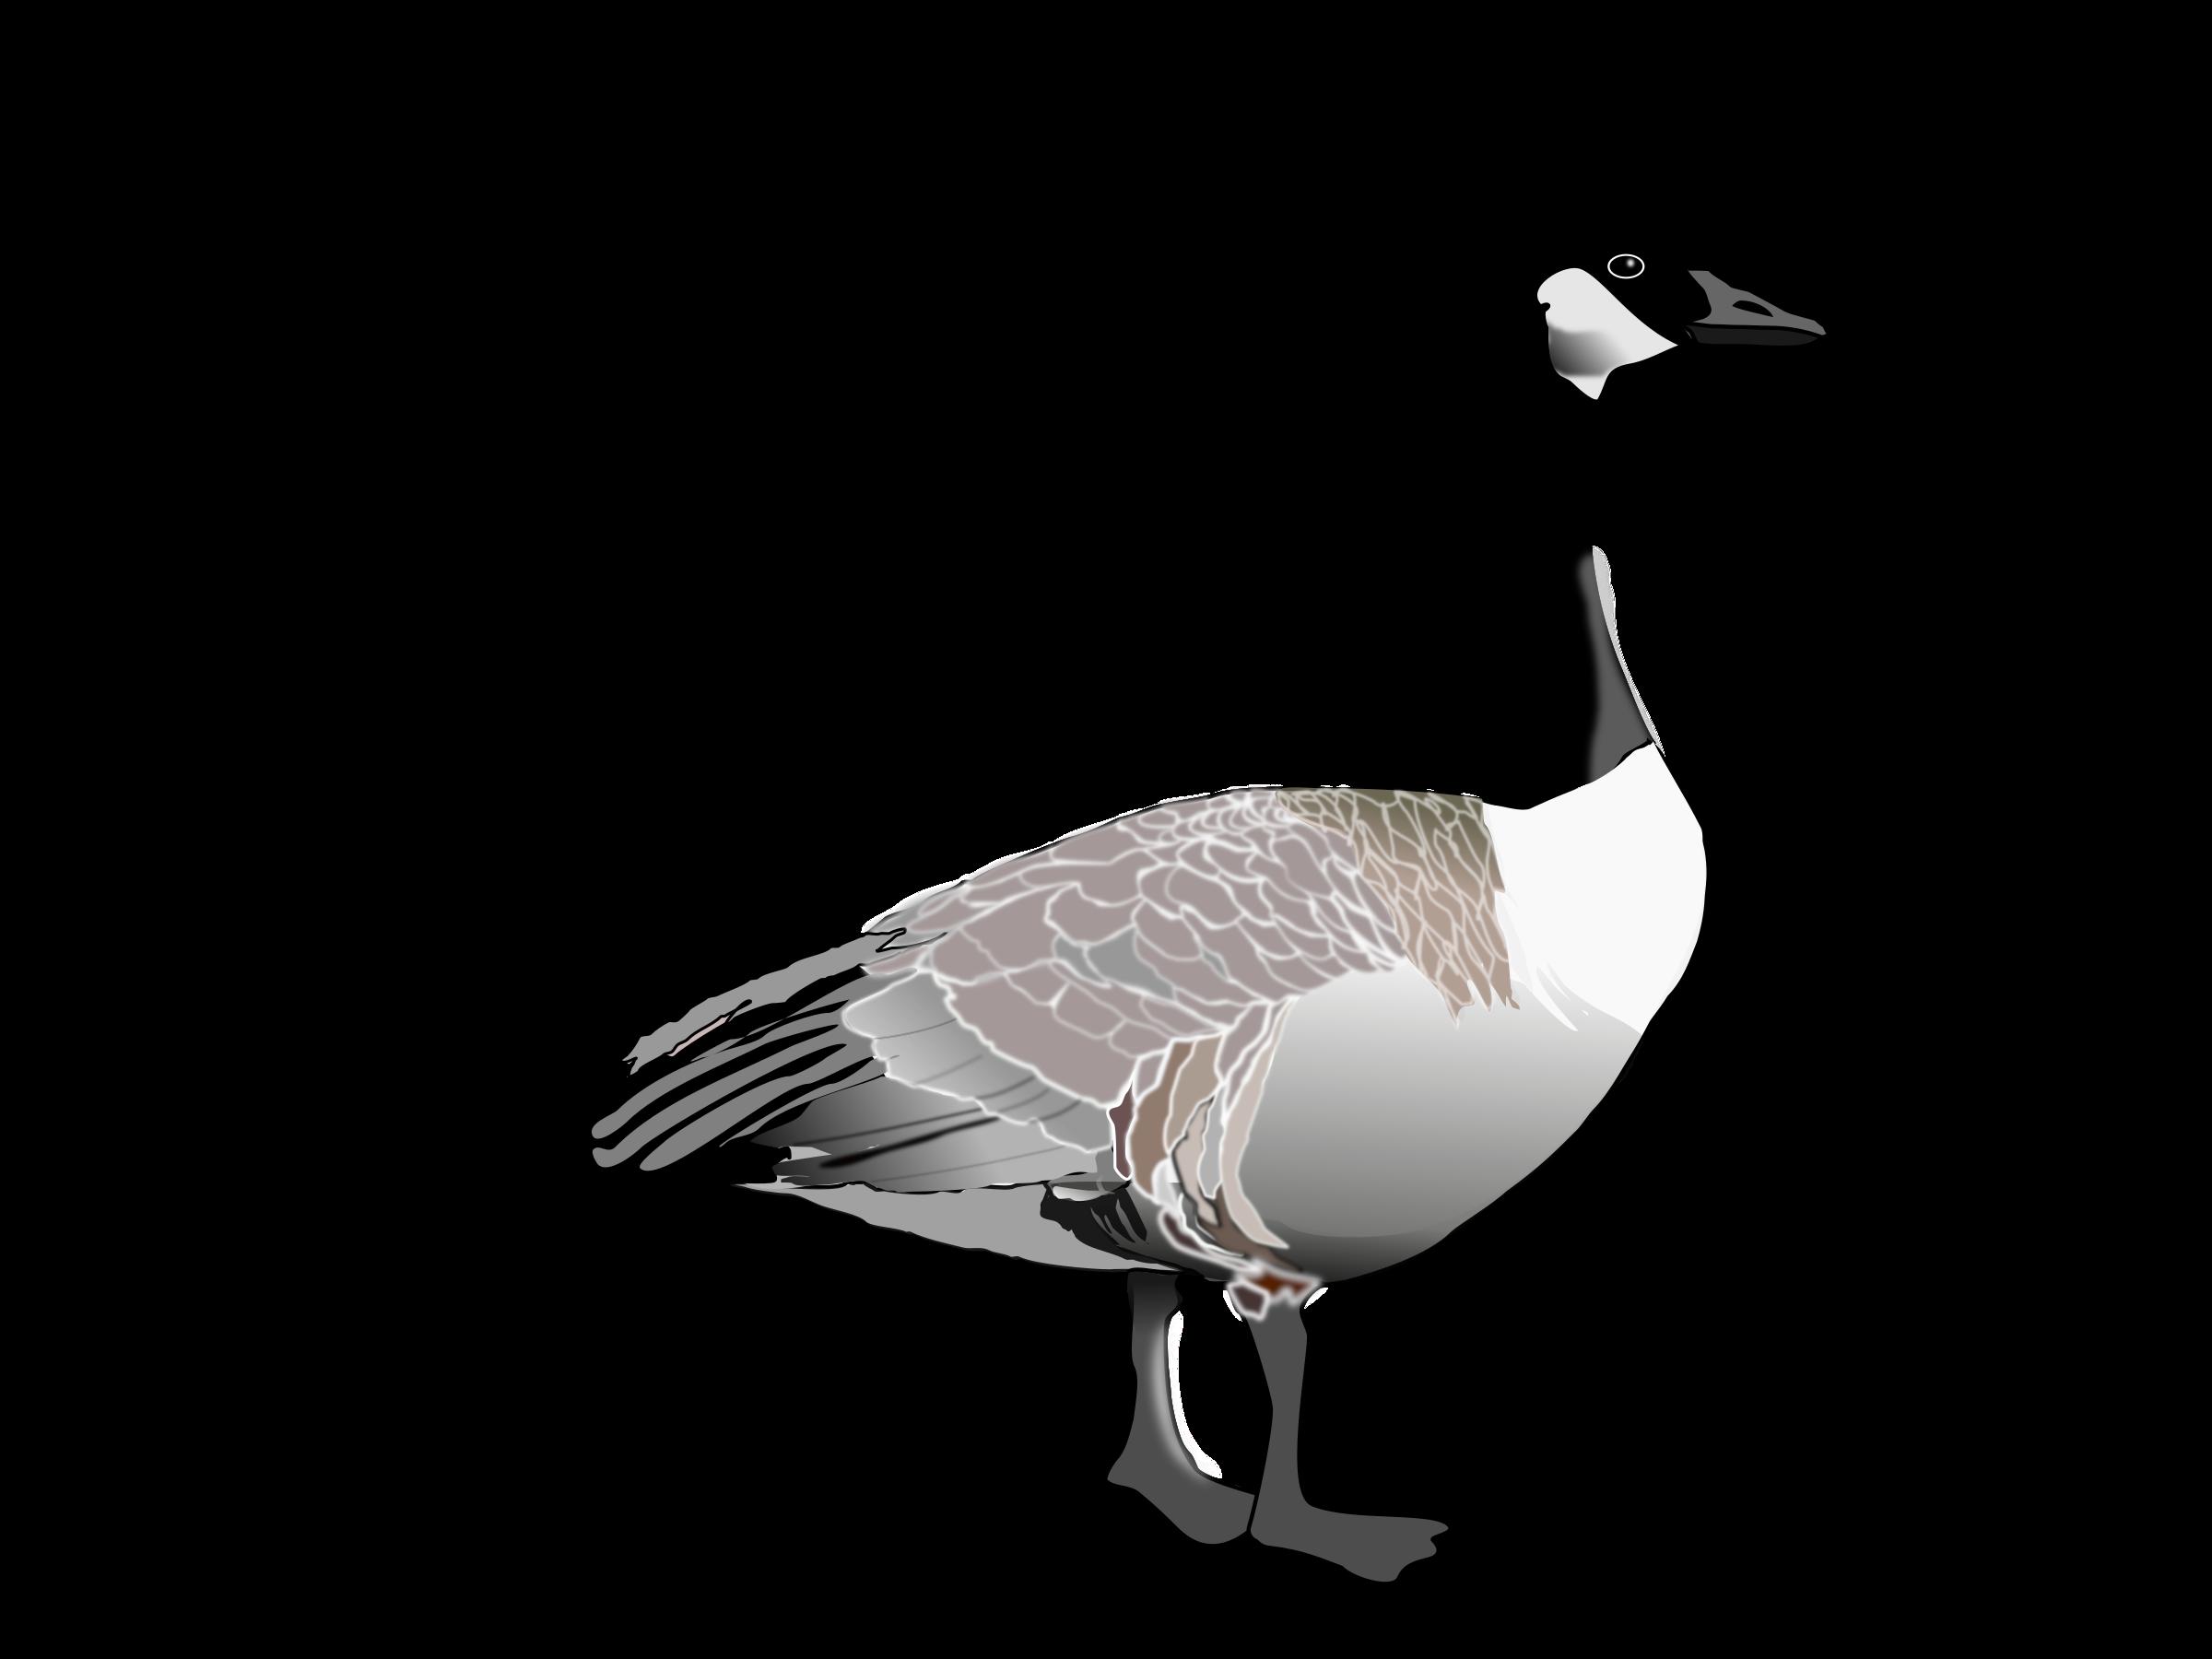 Goose clipart. Canadian big image png